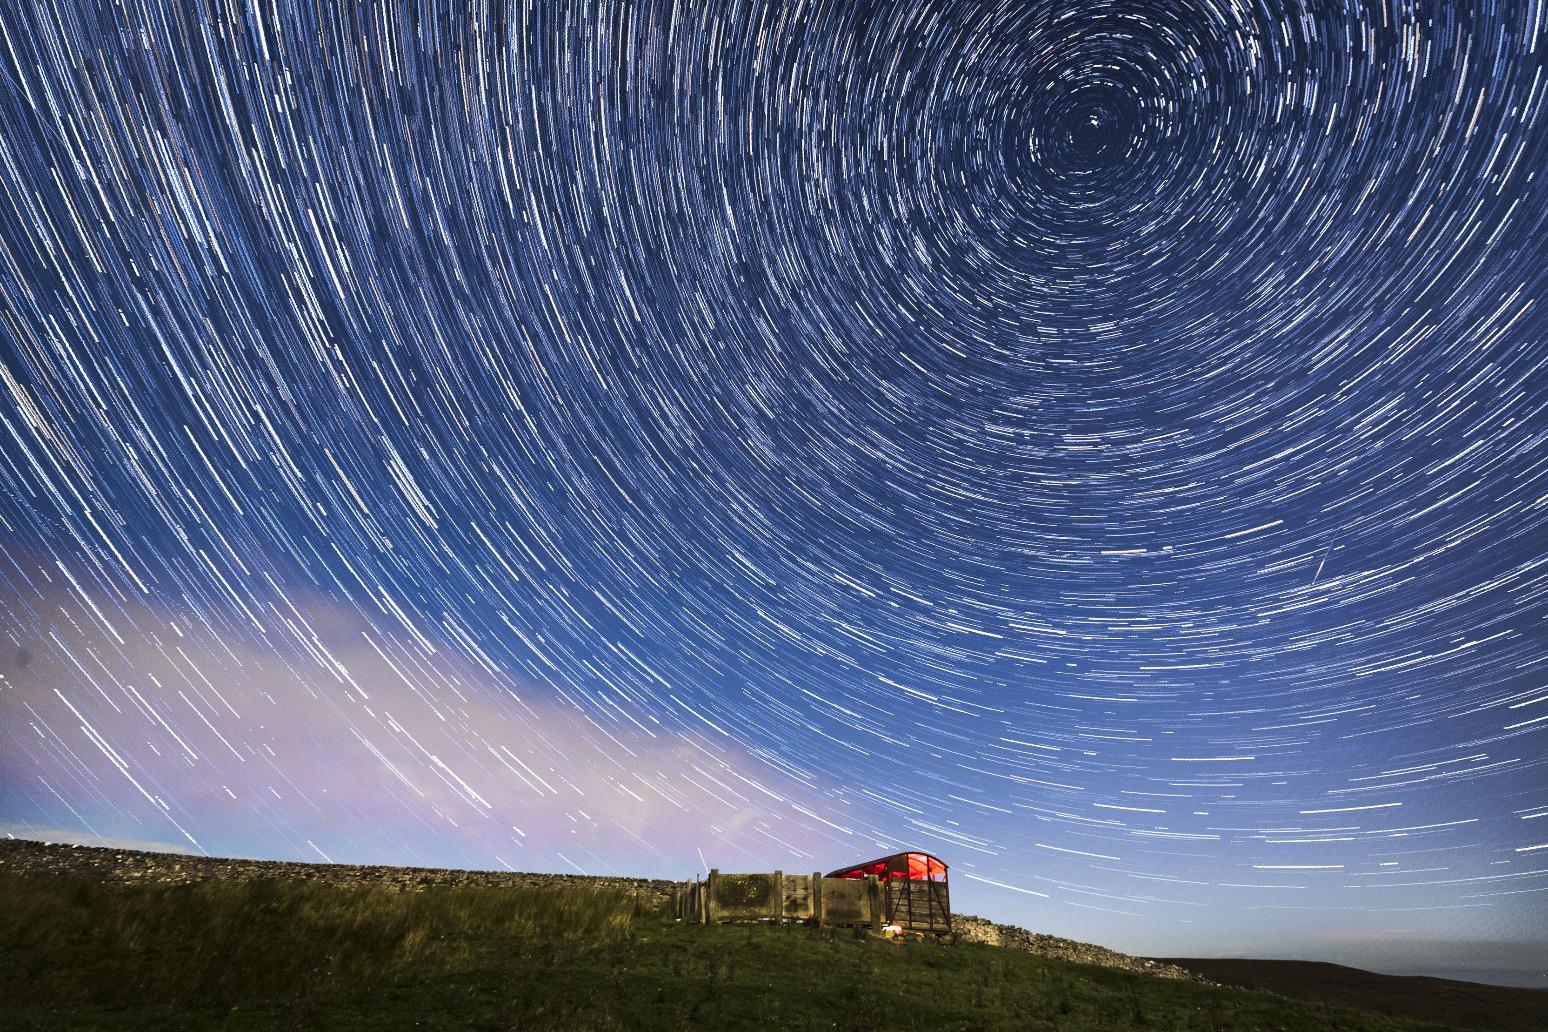 Eta Aquariids set to dazzle night sky with up to 50 meteors per hour